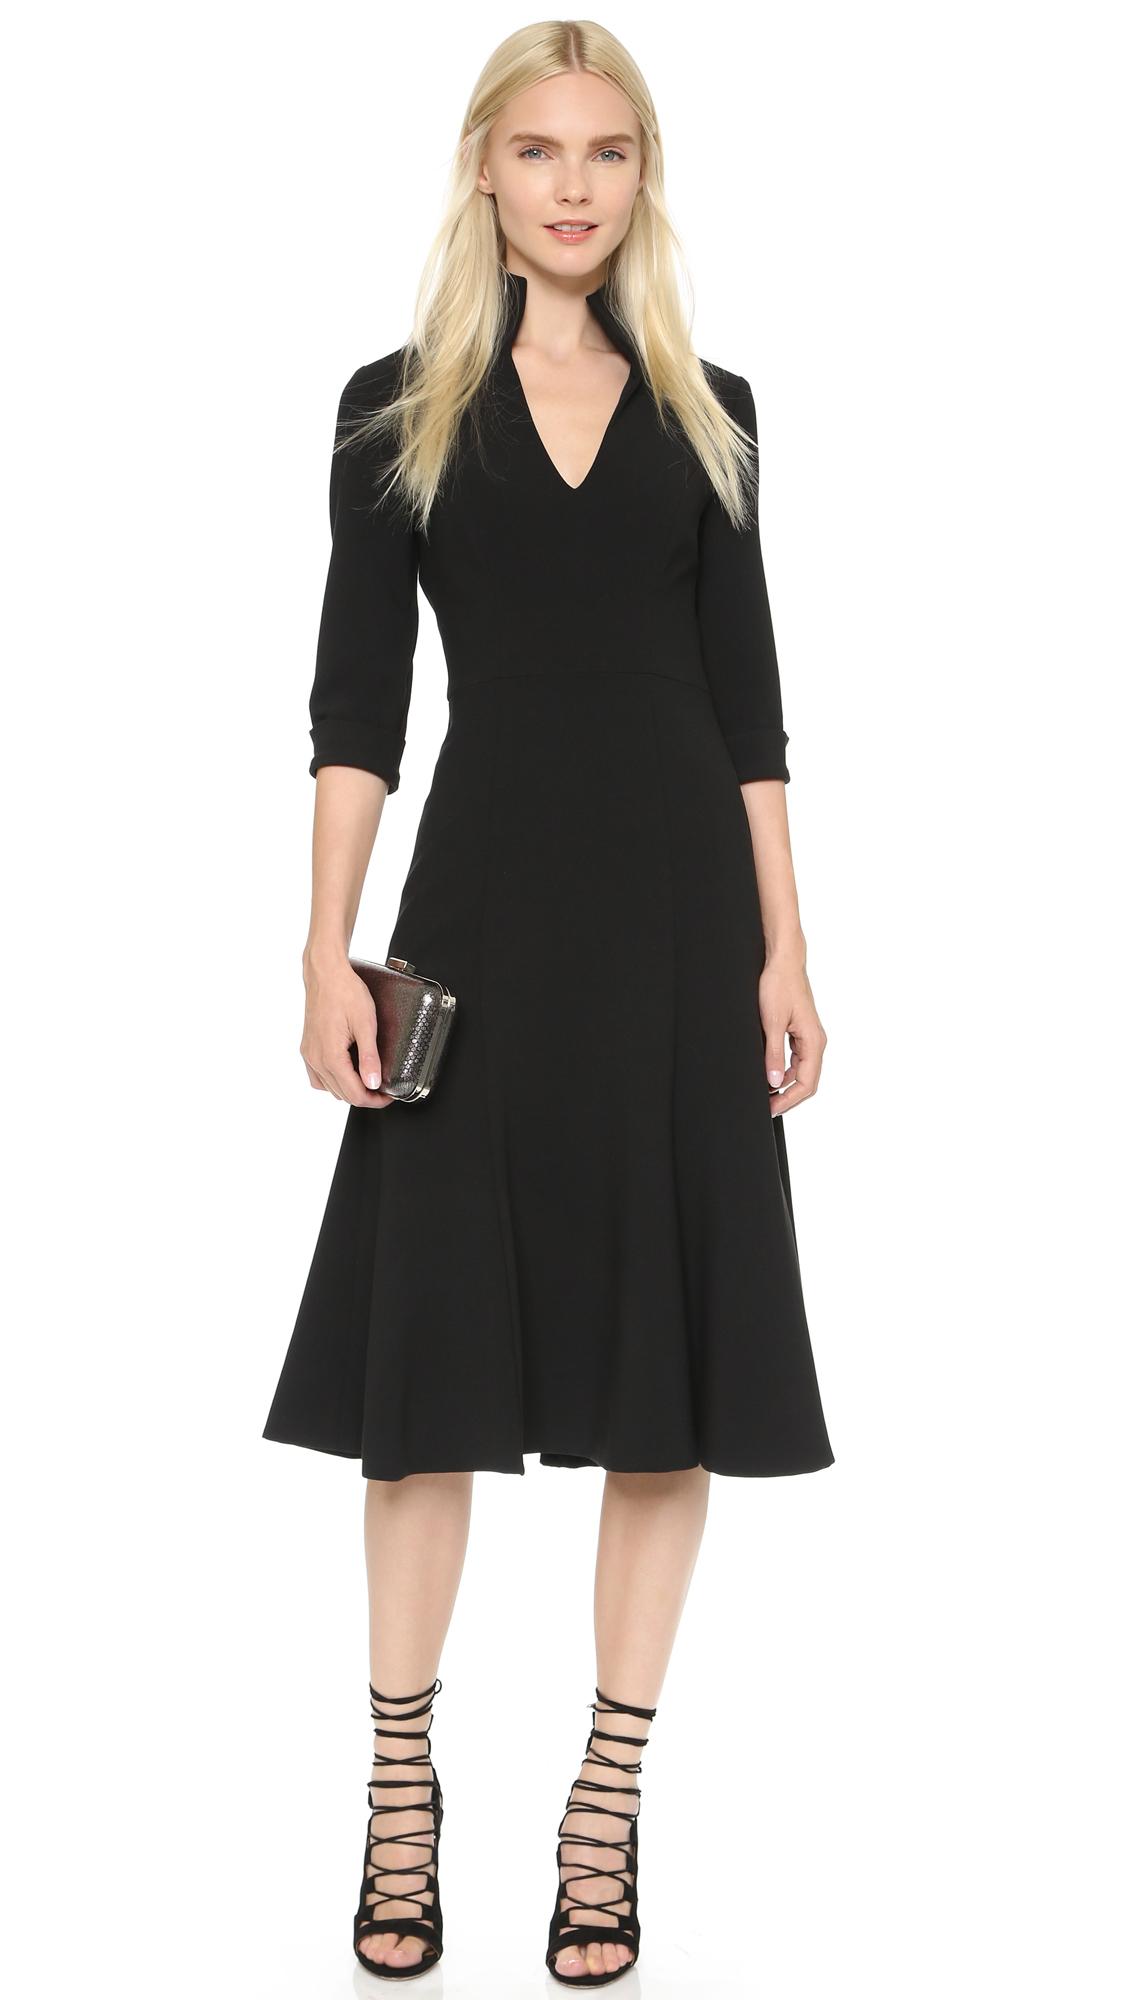 Black Halo Kensington Dress In Black Lyst